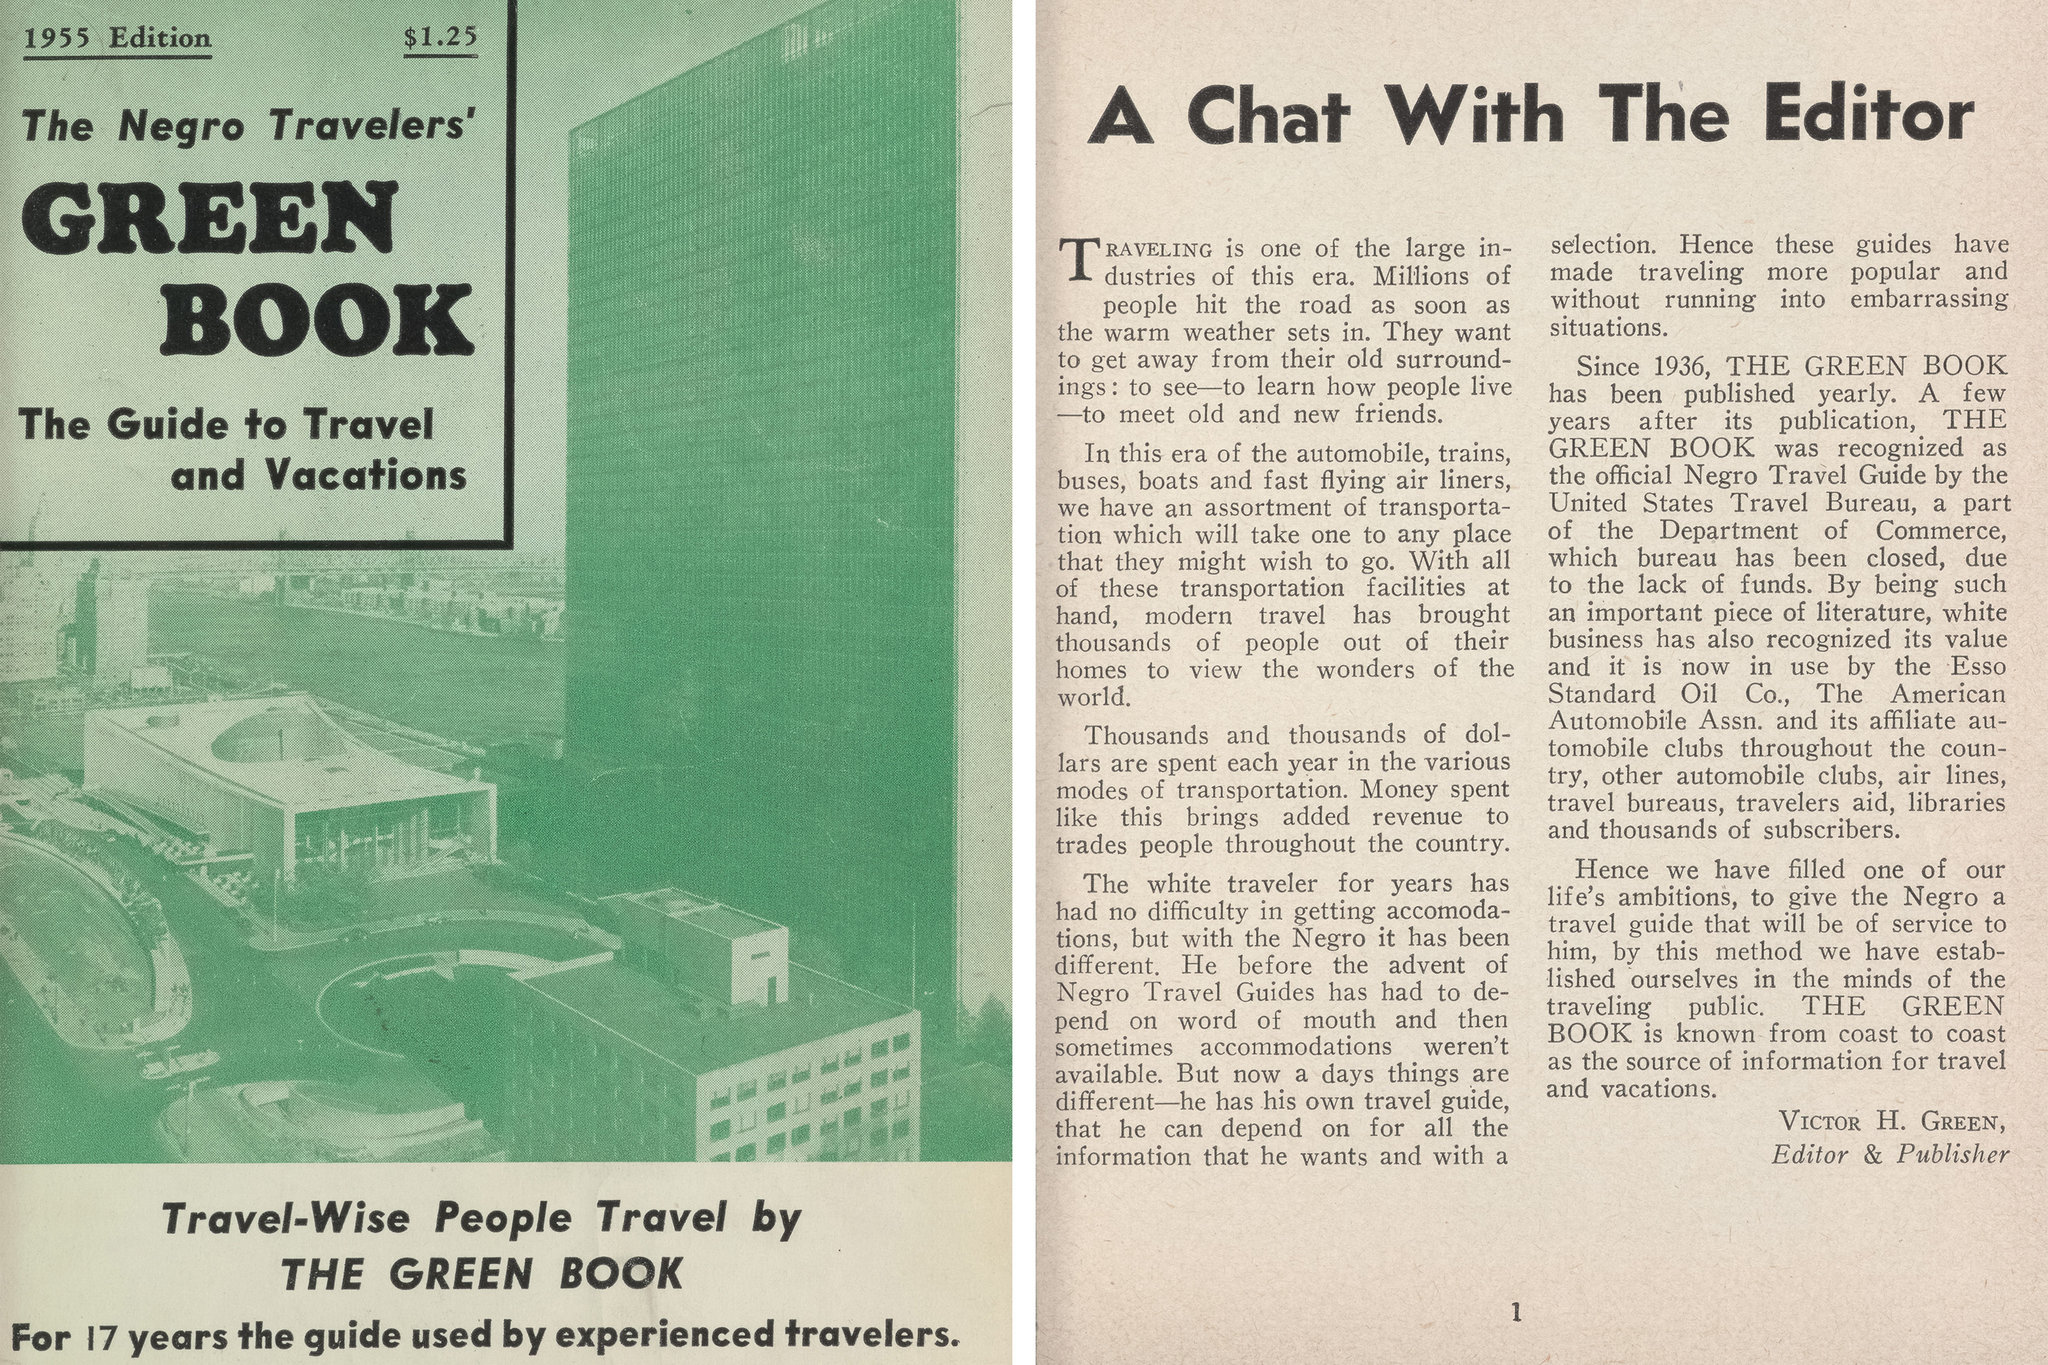 African American History, Black History, The Green Book, Green Book, Racism, KOLUMN Magazine, KOLUMN, Willoughby Avenue